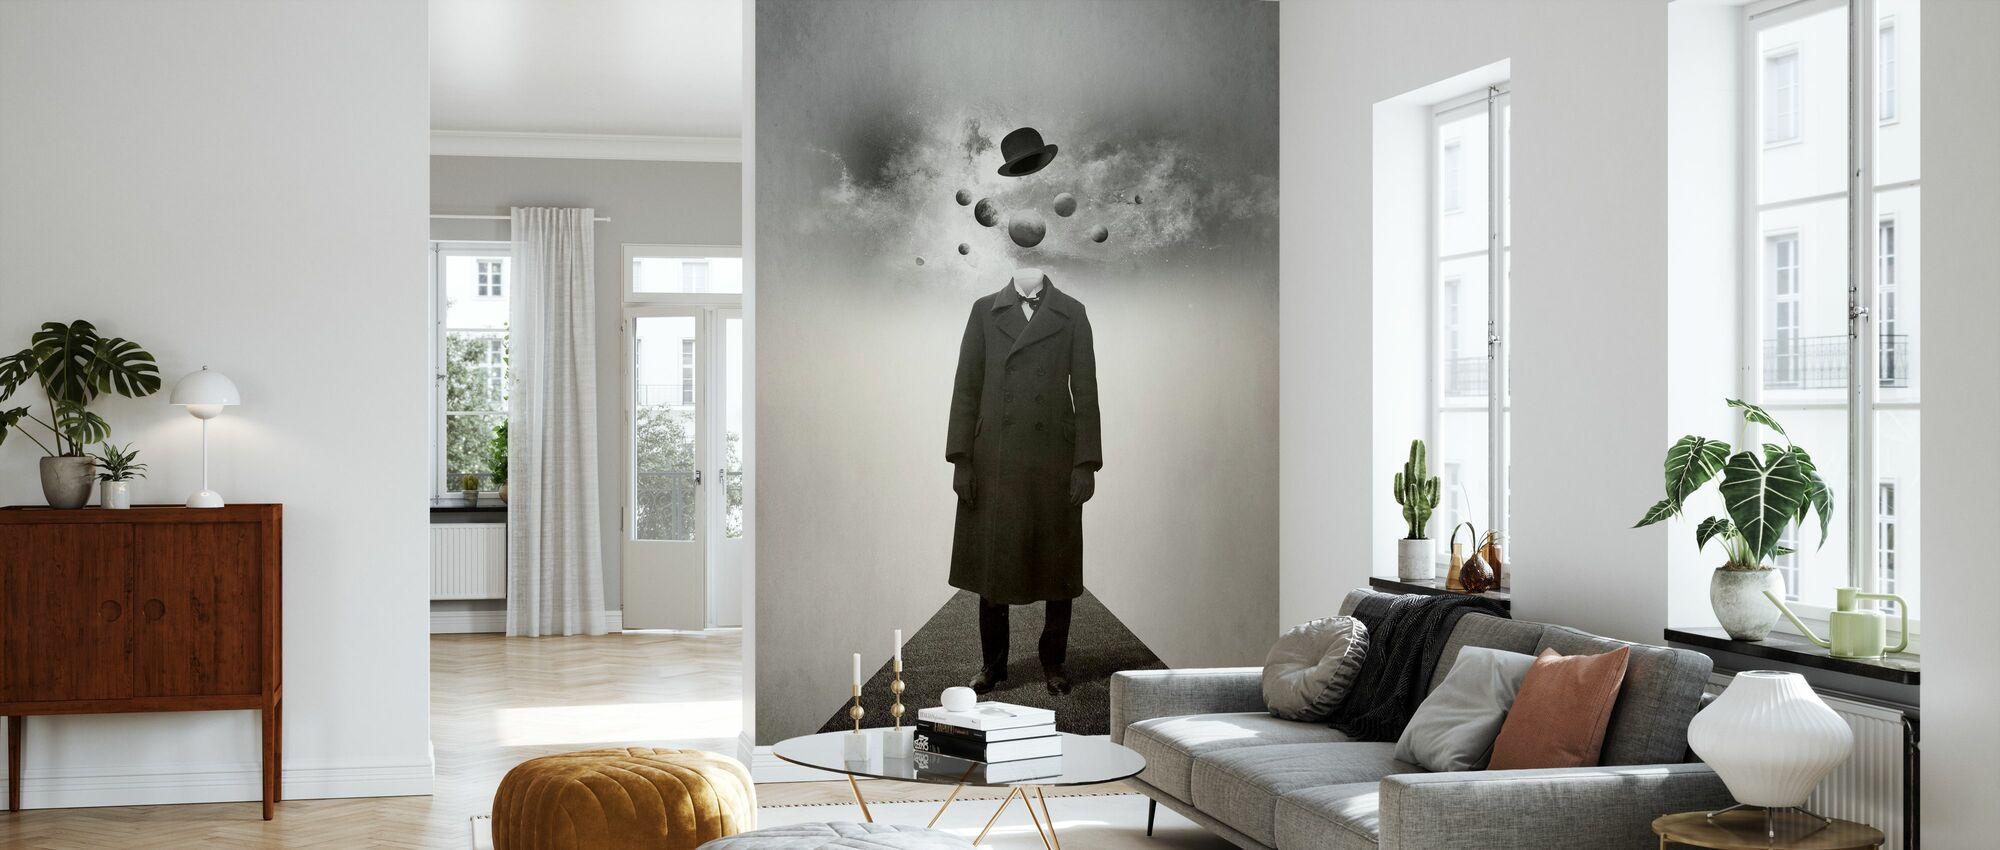 Planets - Wallpaper - Living Room